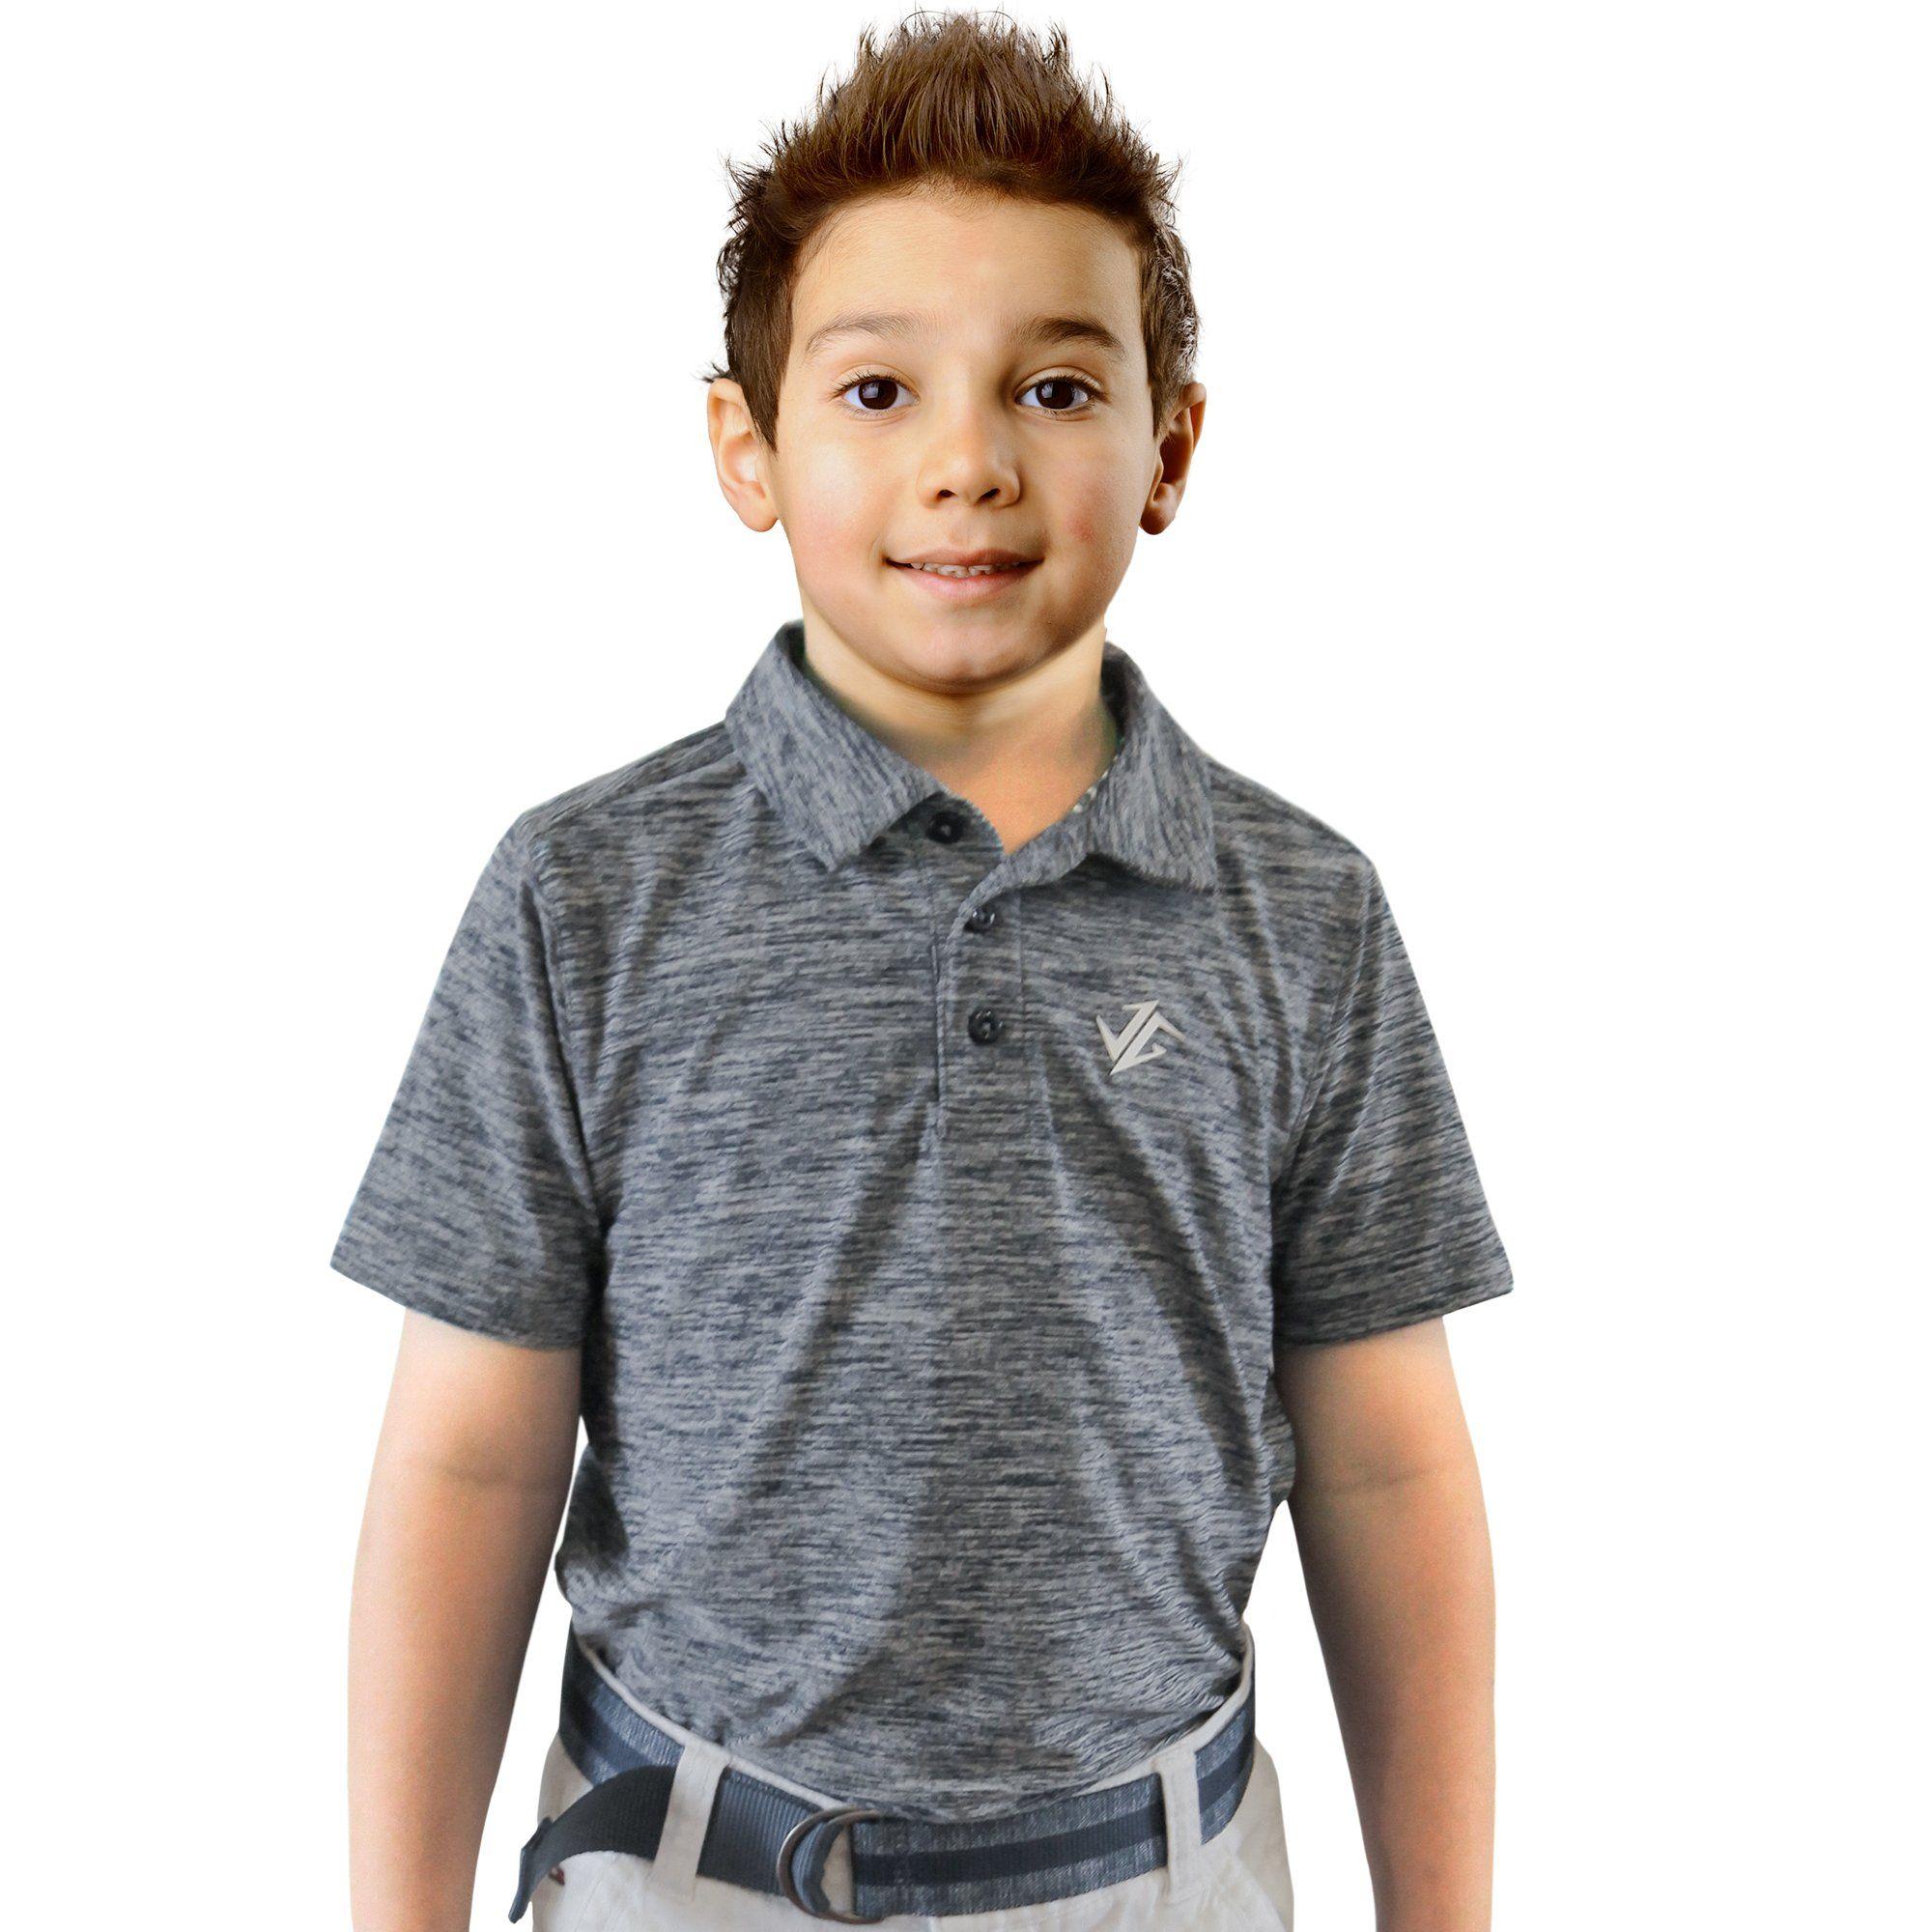 Jolt gear youth boys golf dri fit polo shirt breathable